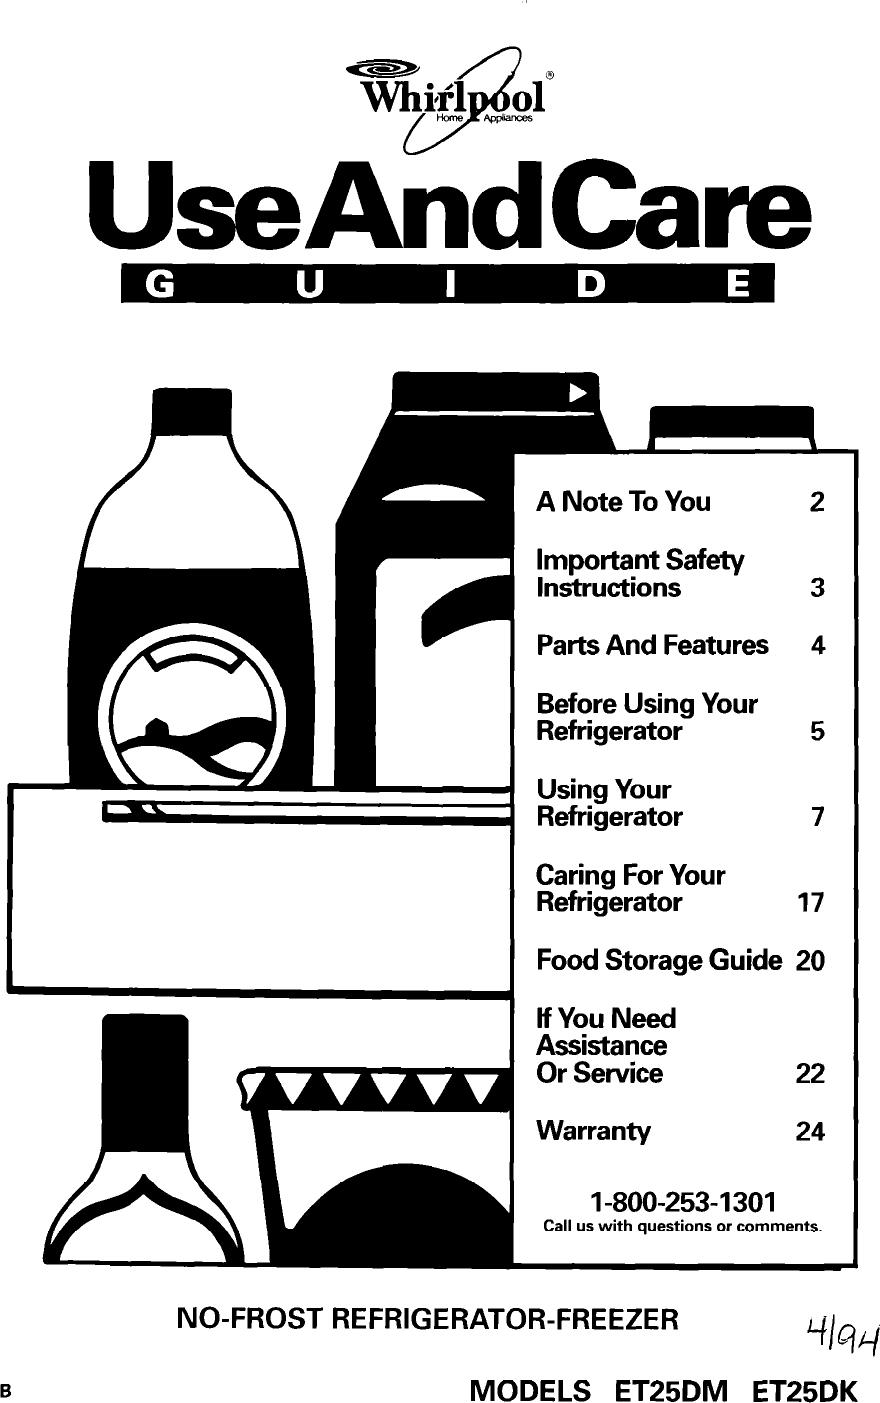 Whirlpool Et25Dk Users Manual